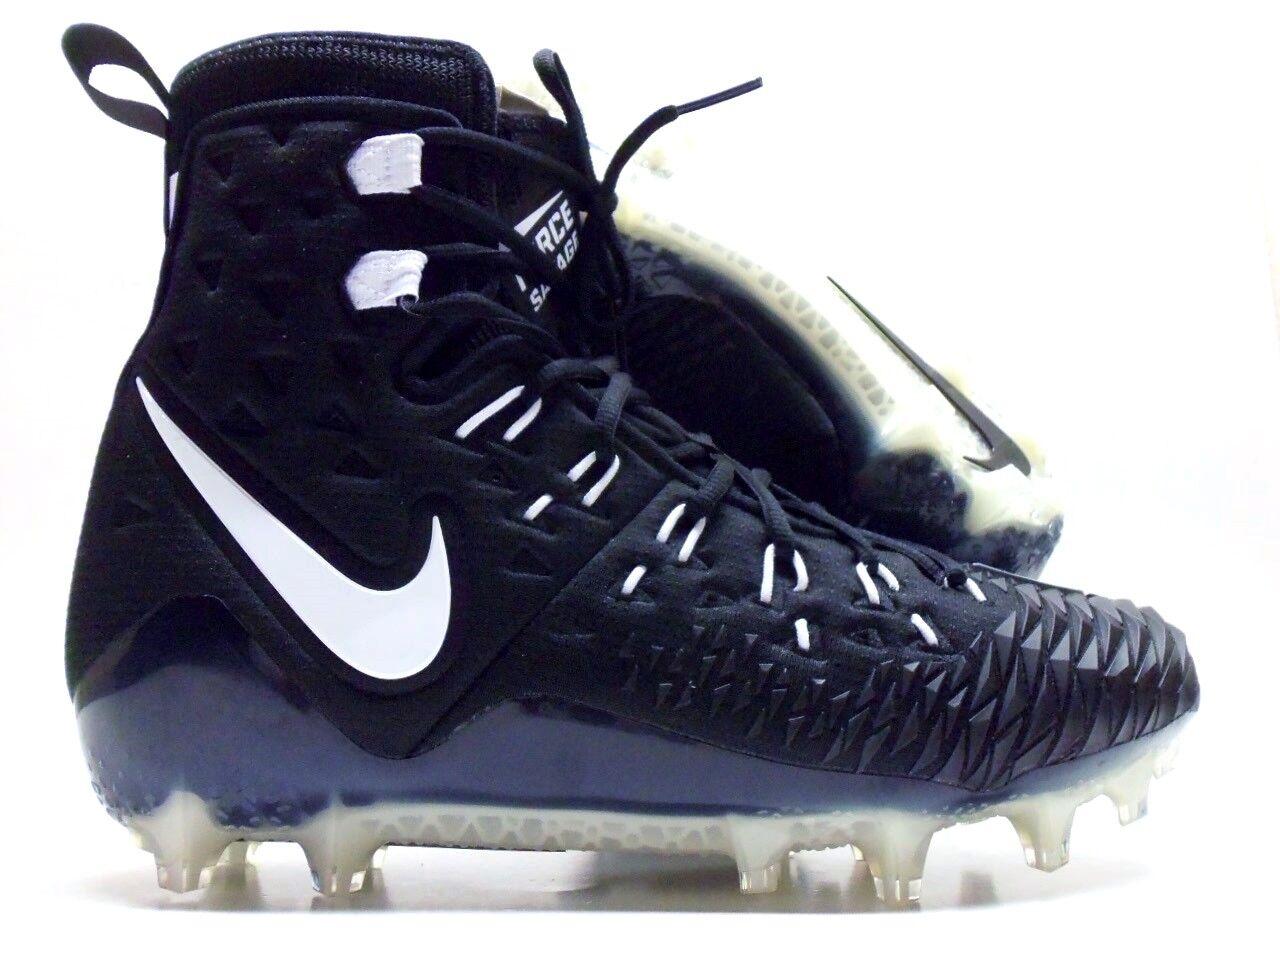 NIKE FORCE SAVAGE ELITE TD FOOTBALL CLEAT BLACK/WHITE Price reduction Seasonal clearance sale